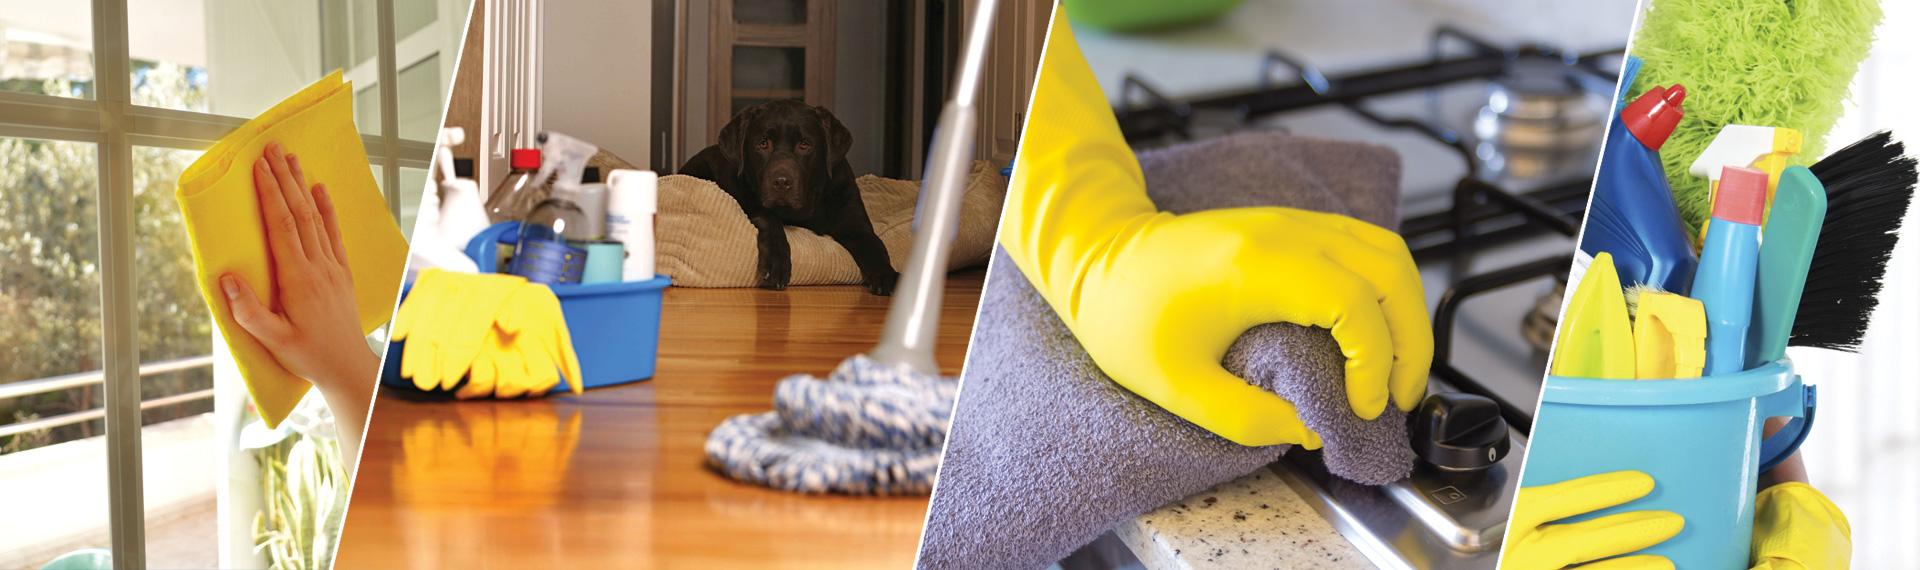 Salma's House Cleaning Tustin CA